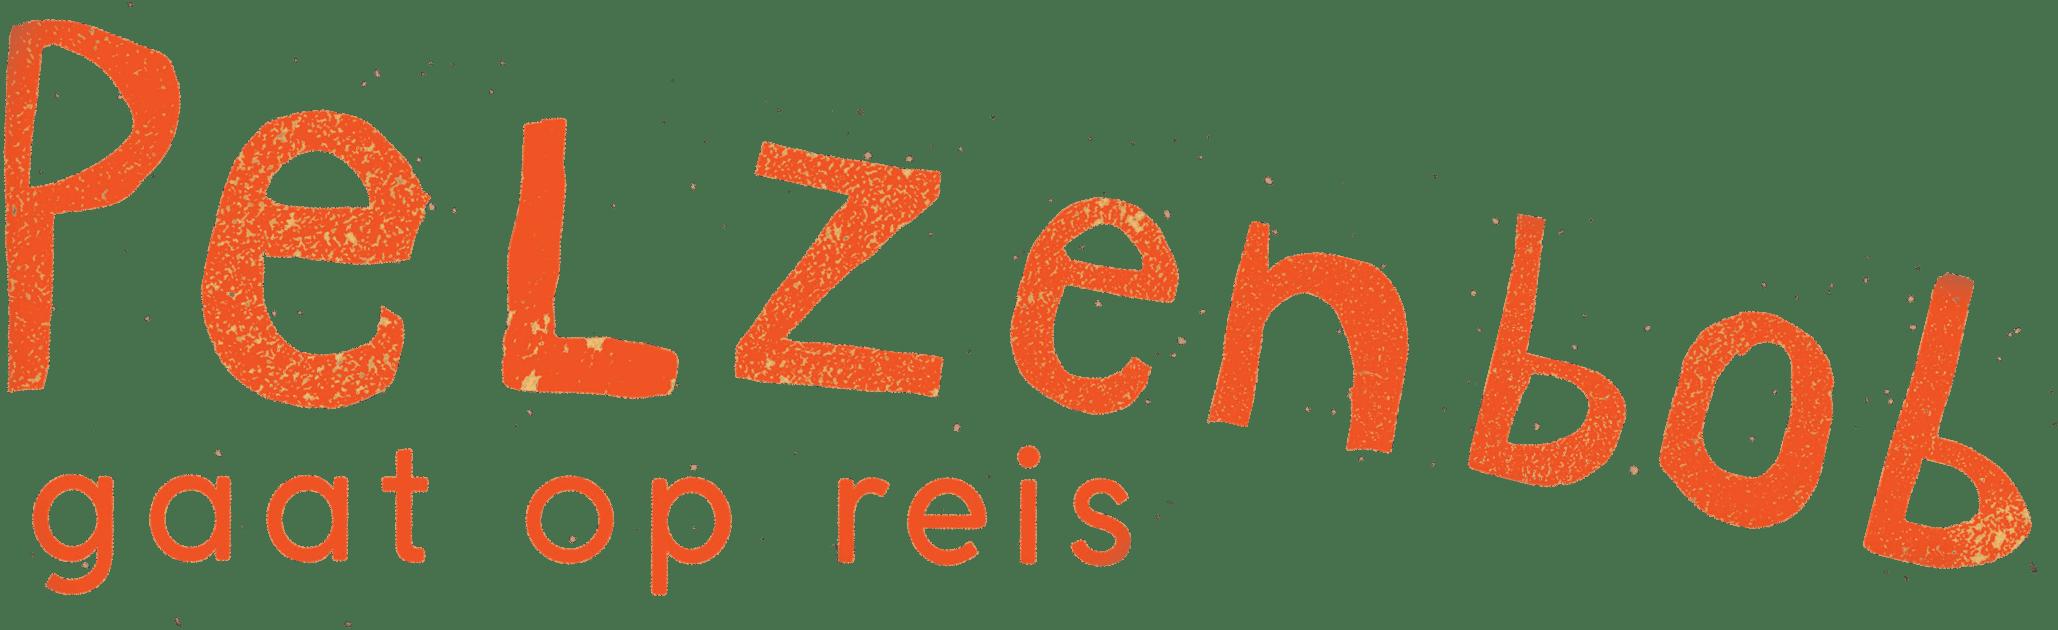 Pelzenbob gaat op reis